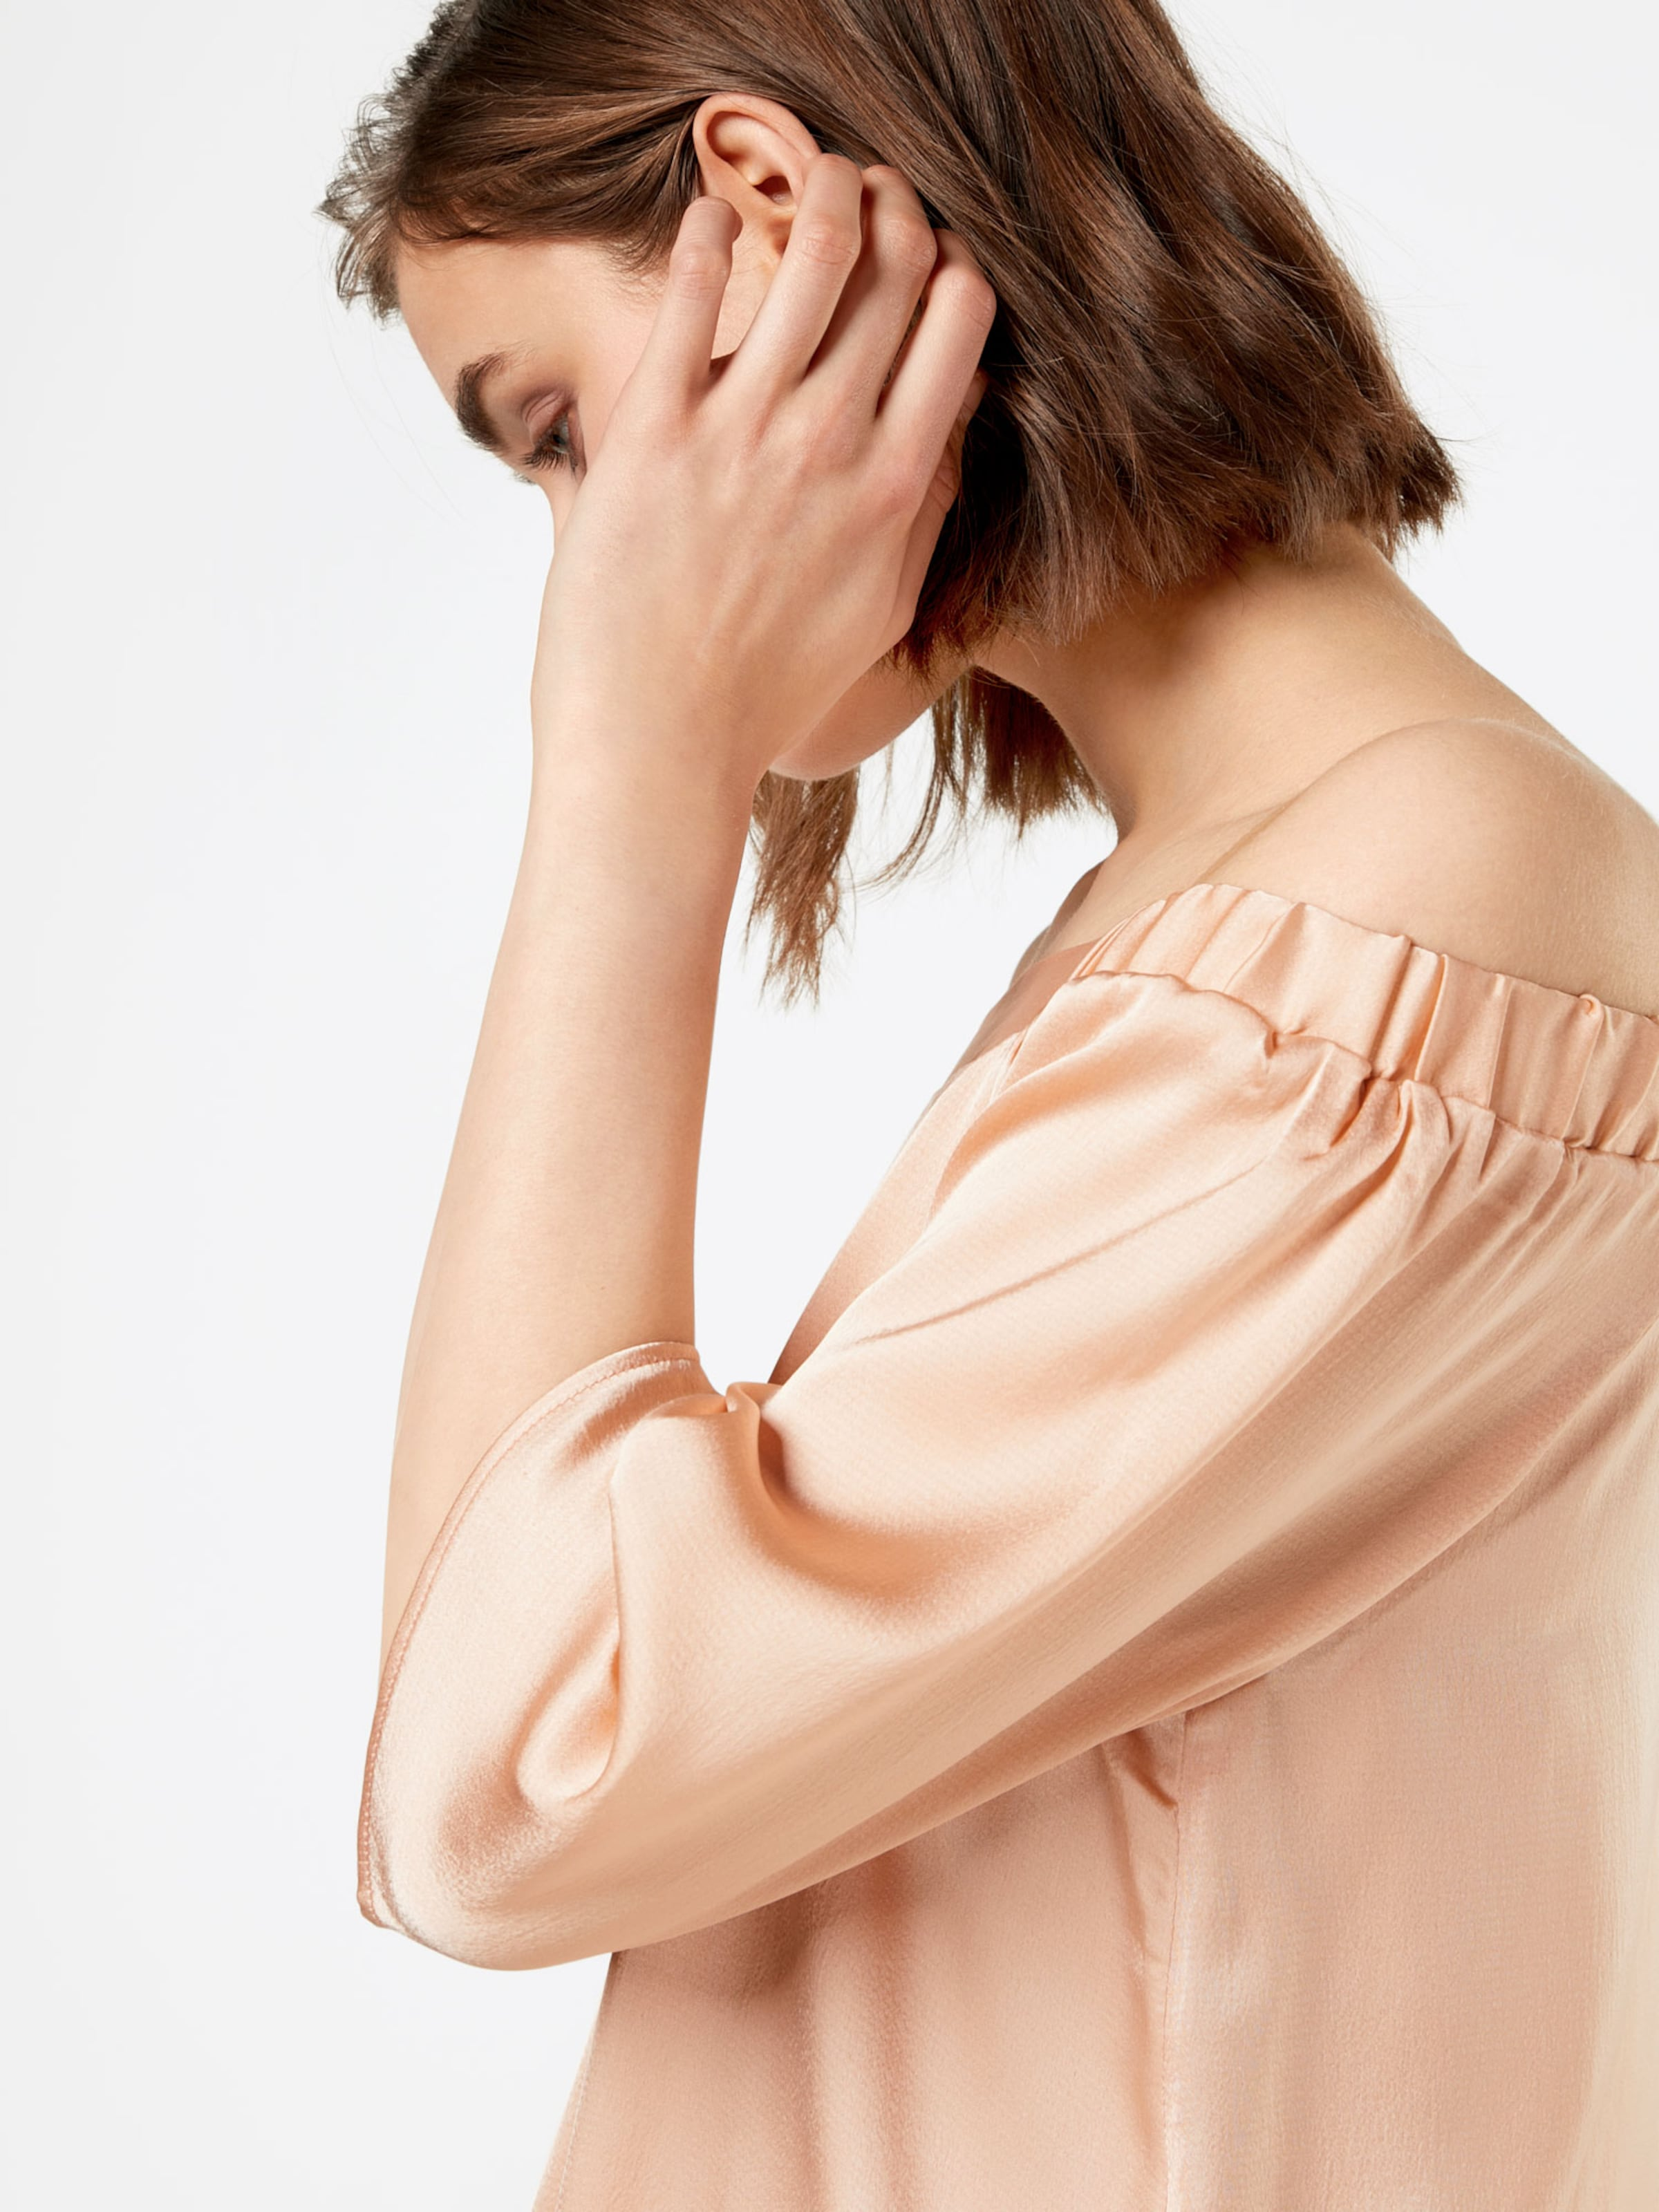 Footlocker Günstig Online Freies Verschiffen Erkunden Blend She Off-Shoulder Bluse 'Hanna' Größte Anbieter Footlocker Zum Verkauf Pnjze5NPfq